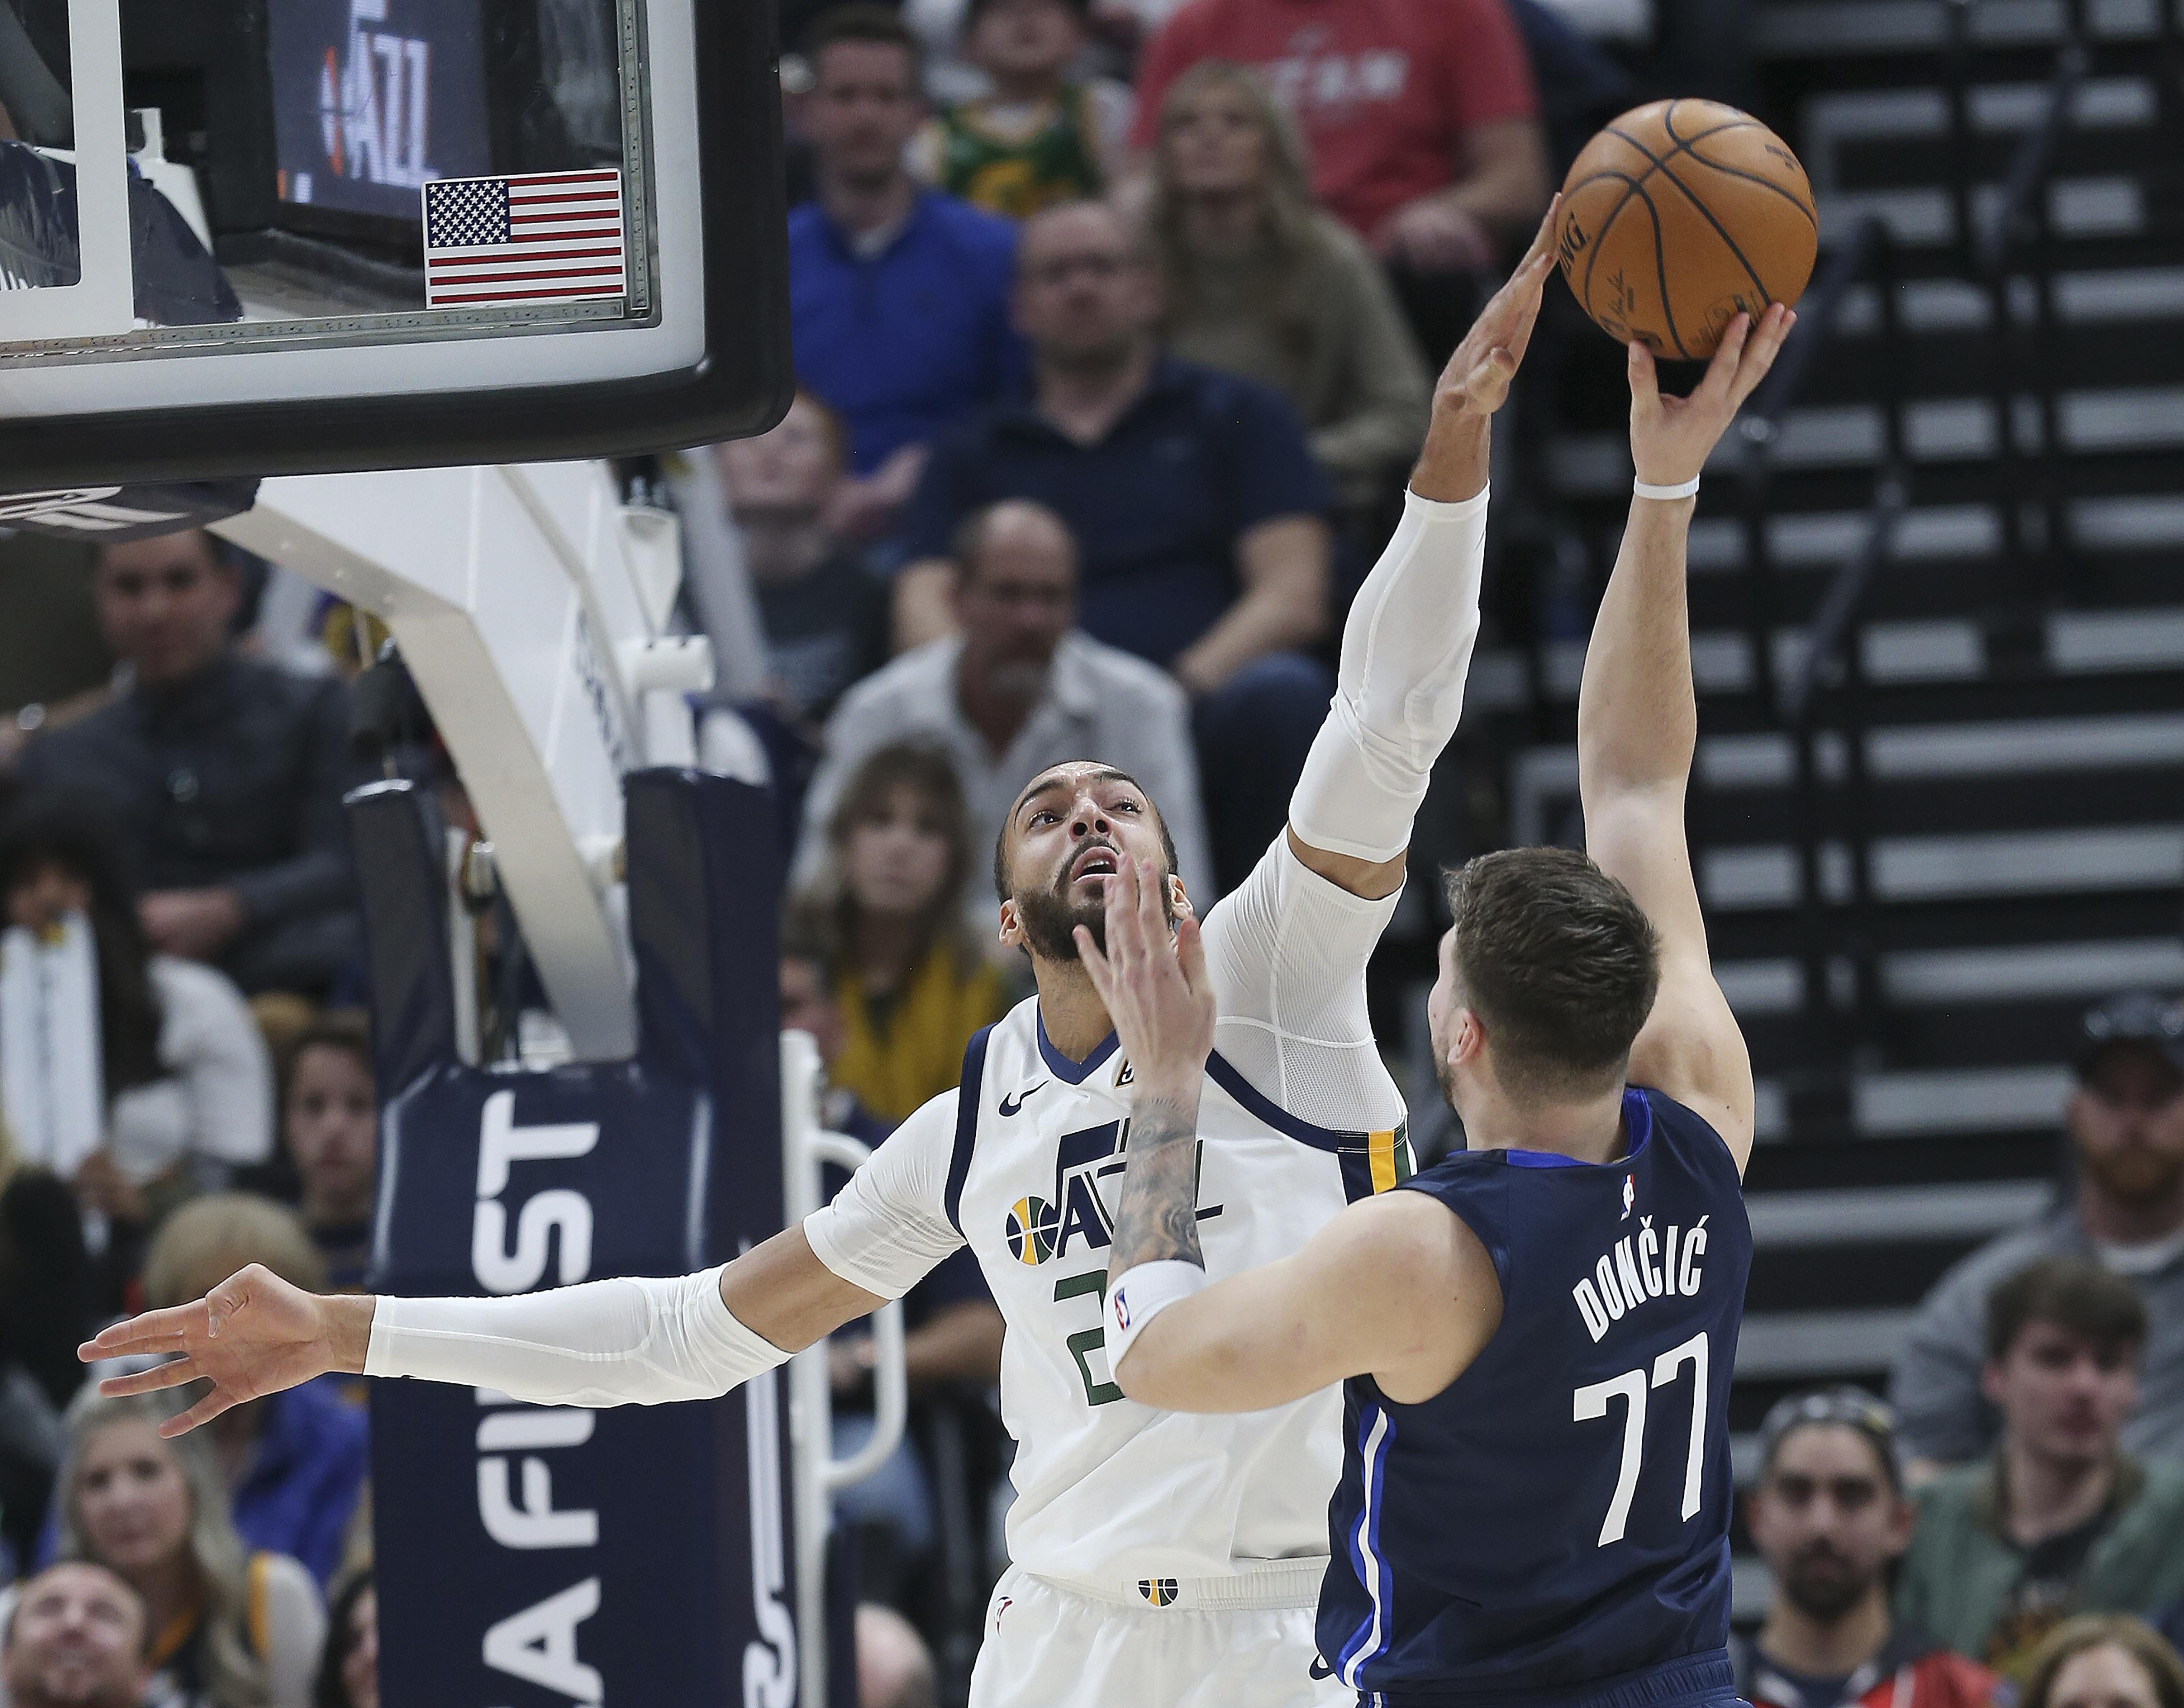 Utah Jazz center Rudy Gobert (27) blocks a shot by Dallas Mavericks guard Luka Doncic (77).